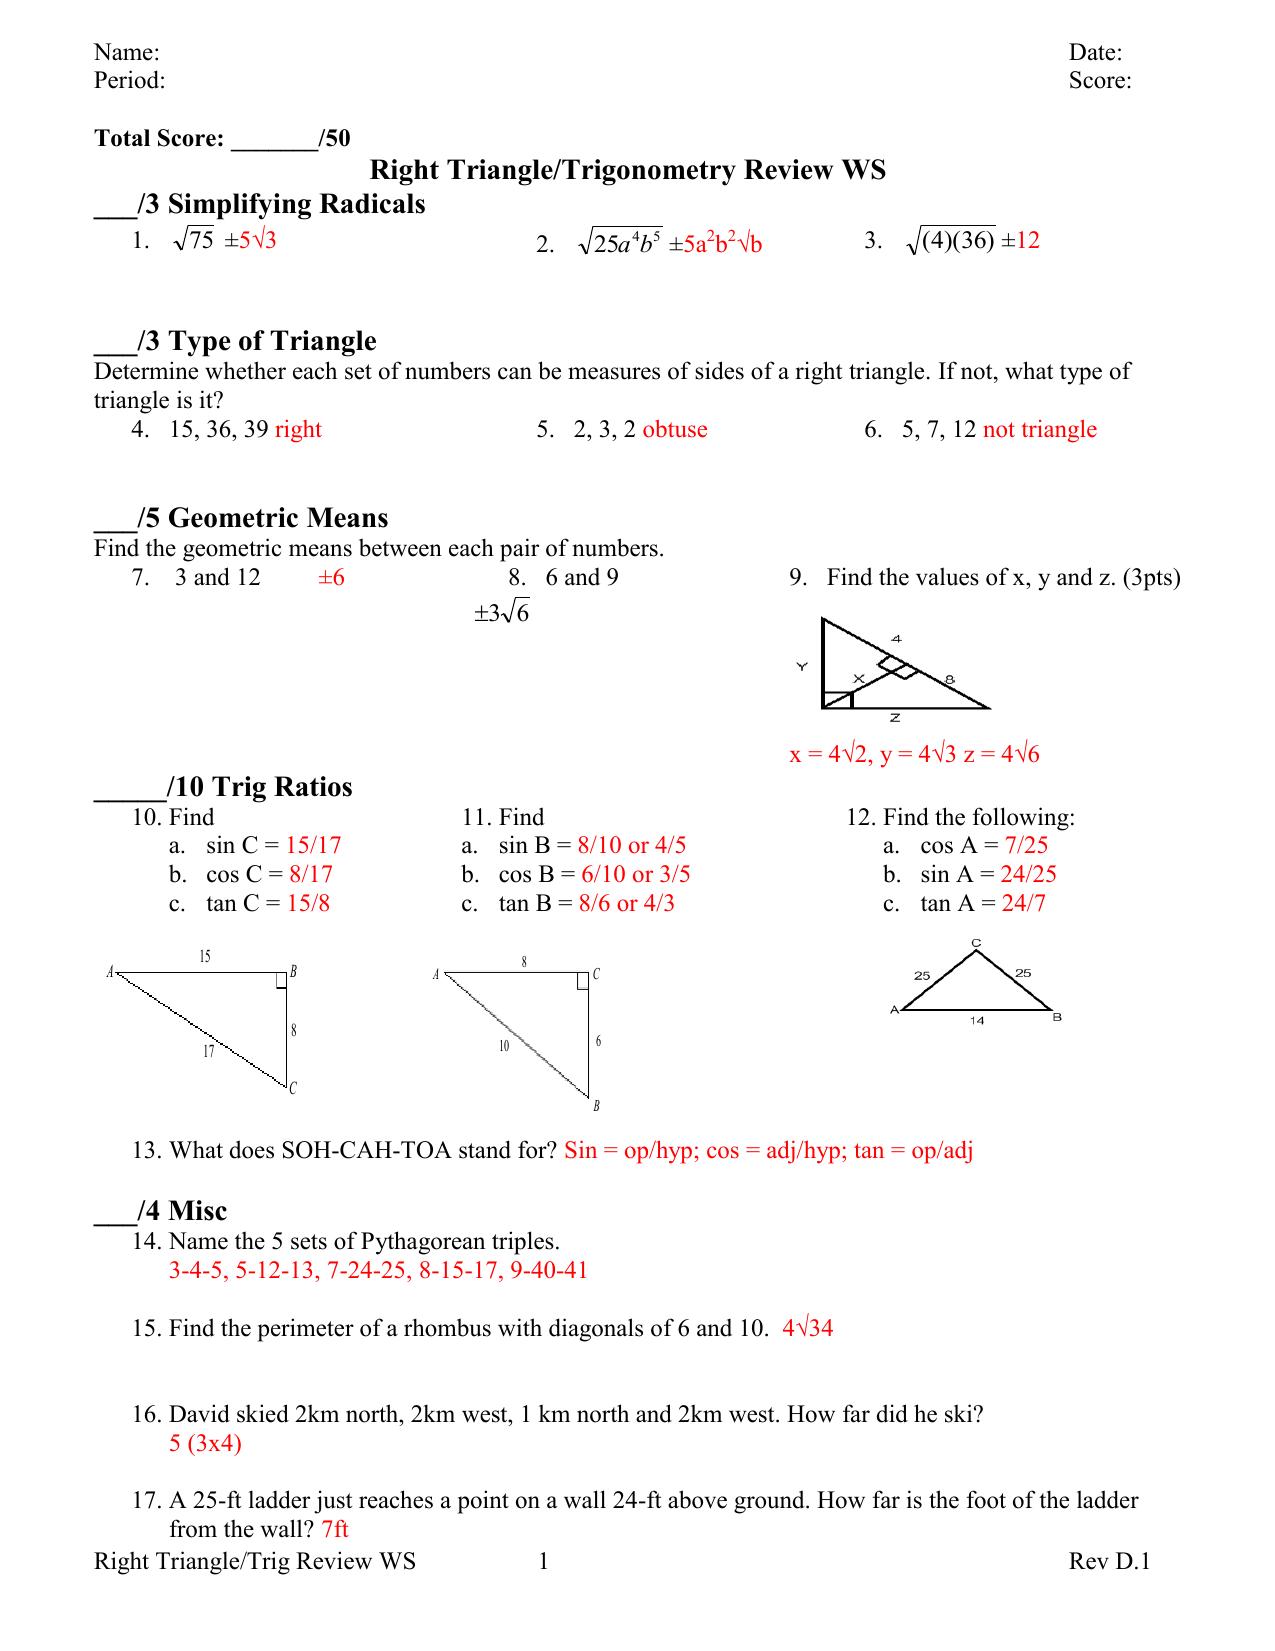 Right Triangle/Trigonometry Review WS